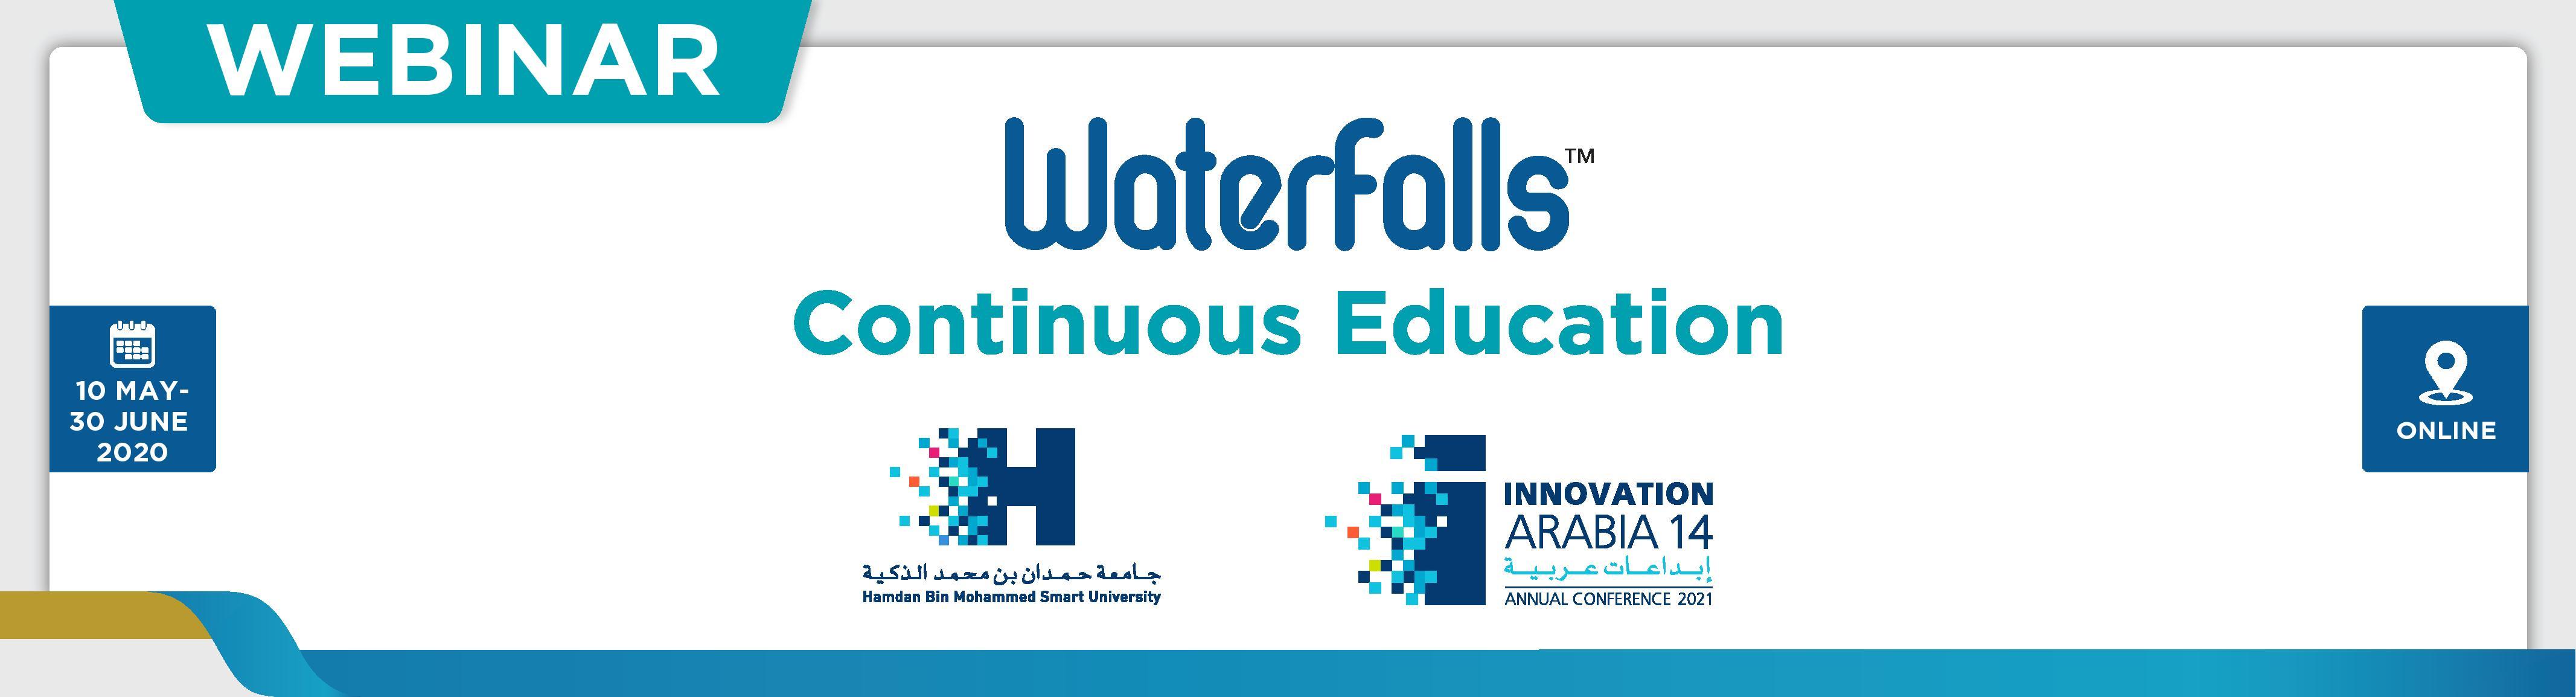 Waterfalls Webinar- HBMSU (18th May)